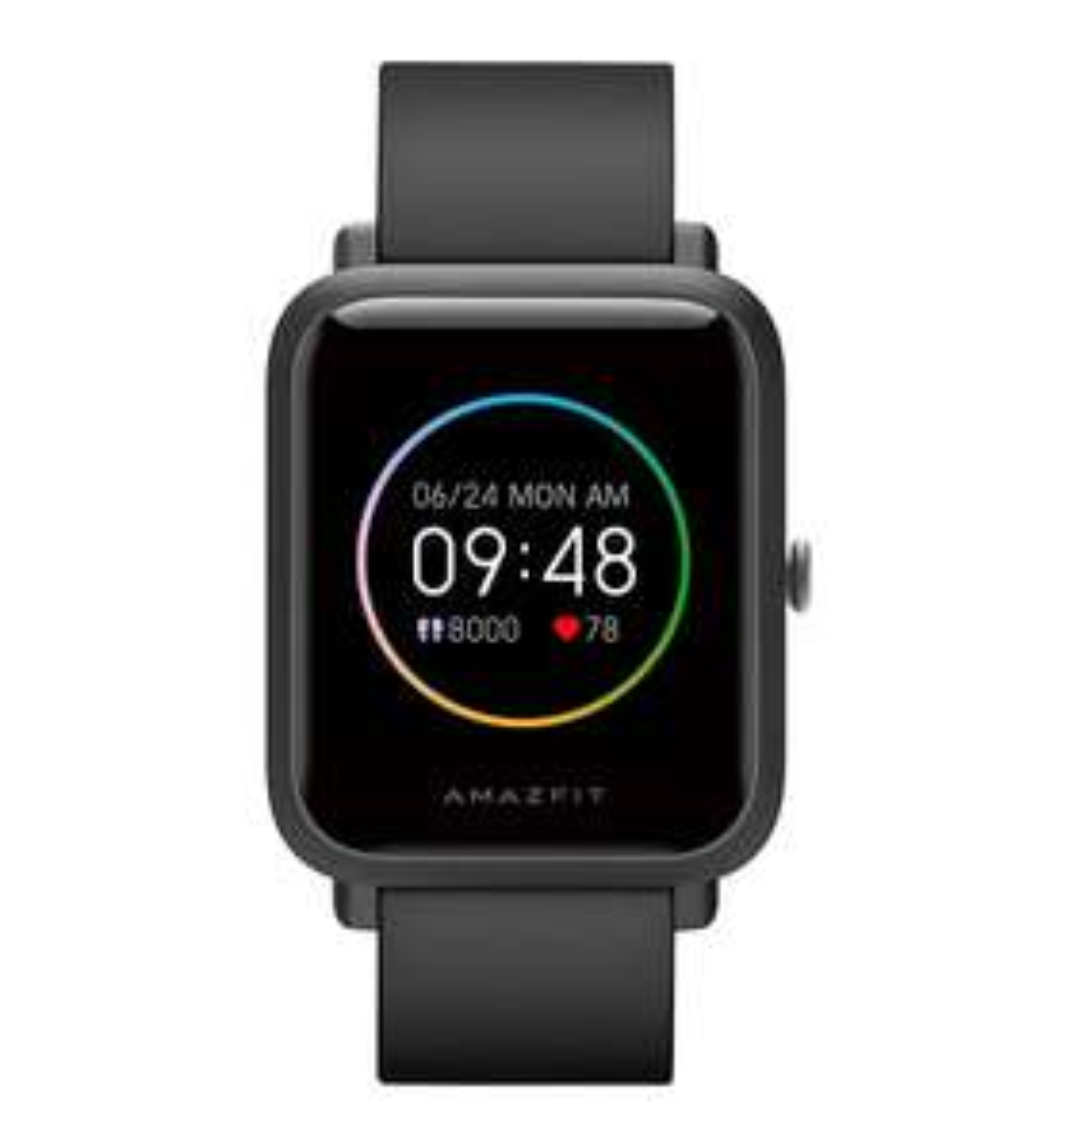 Amazfit Bip S Lite Smartwatch Fitness Watch with Heart Rate Smartwatch - £34.11 @ Amazon